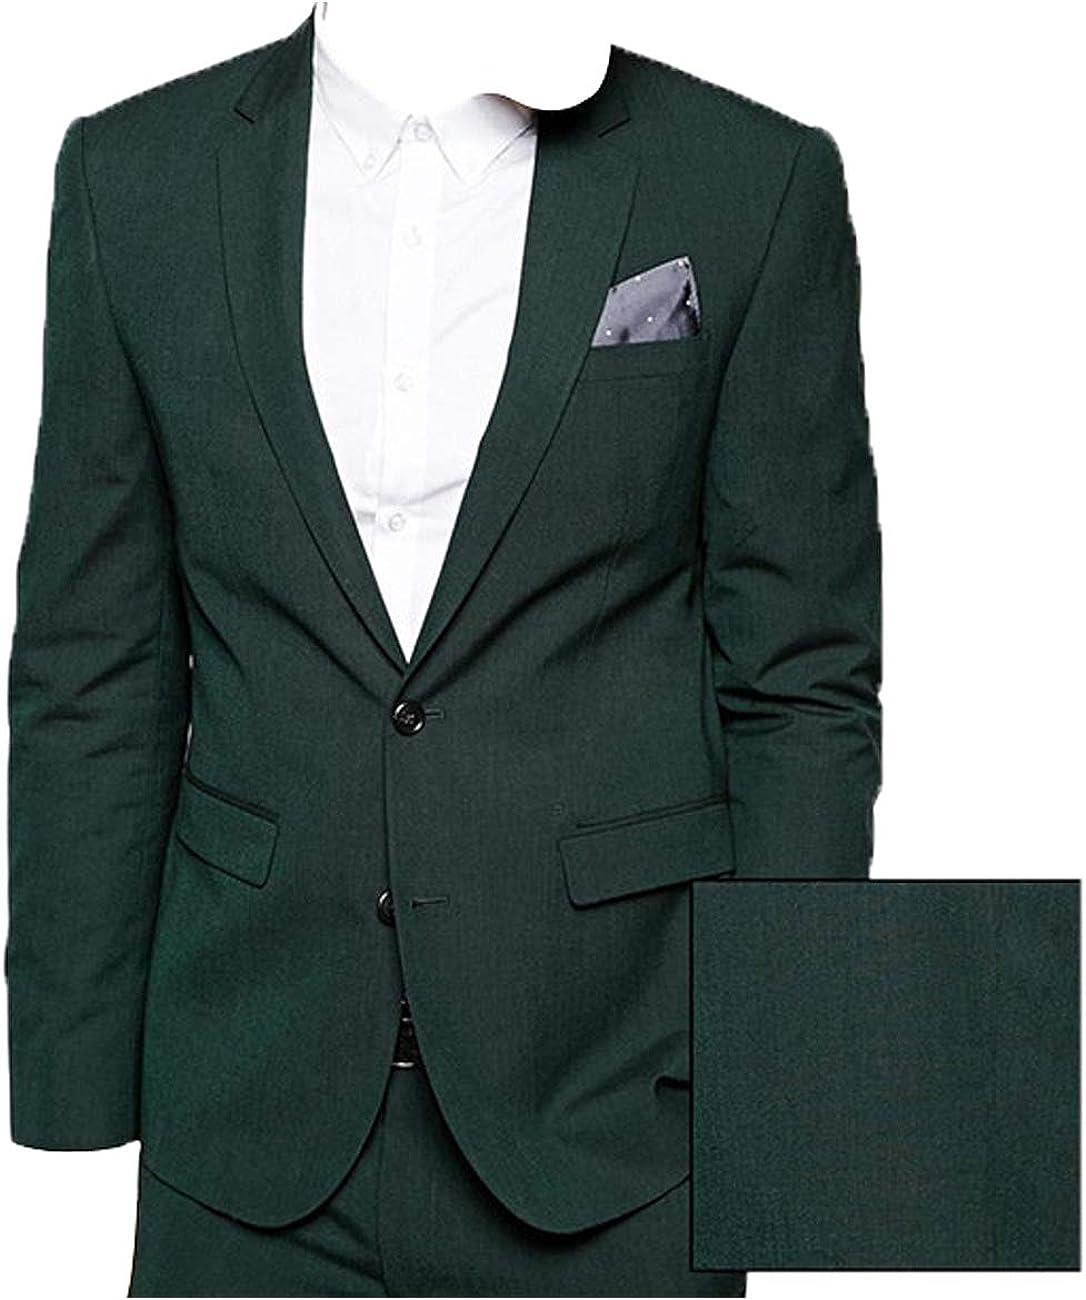 HBDesign Mens 2 Piece 2 Button Casual Fashion Dress Suits Dark Green